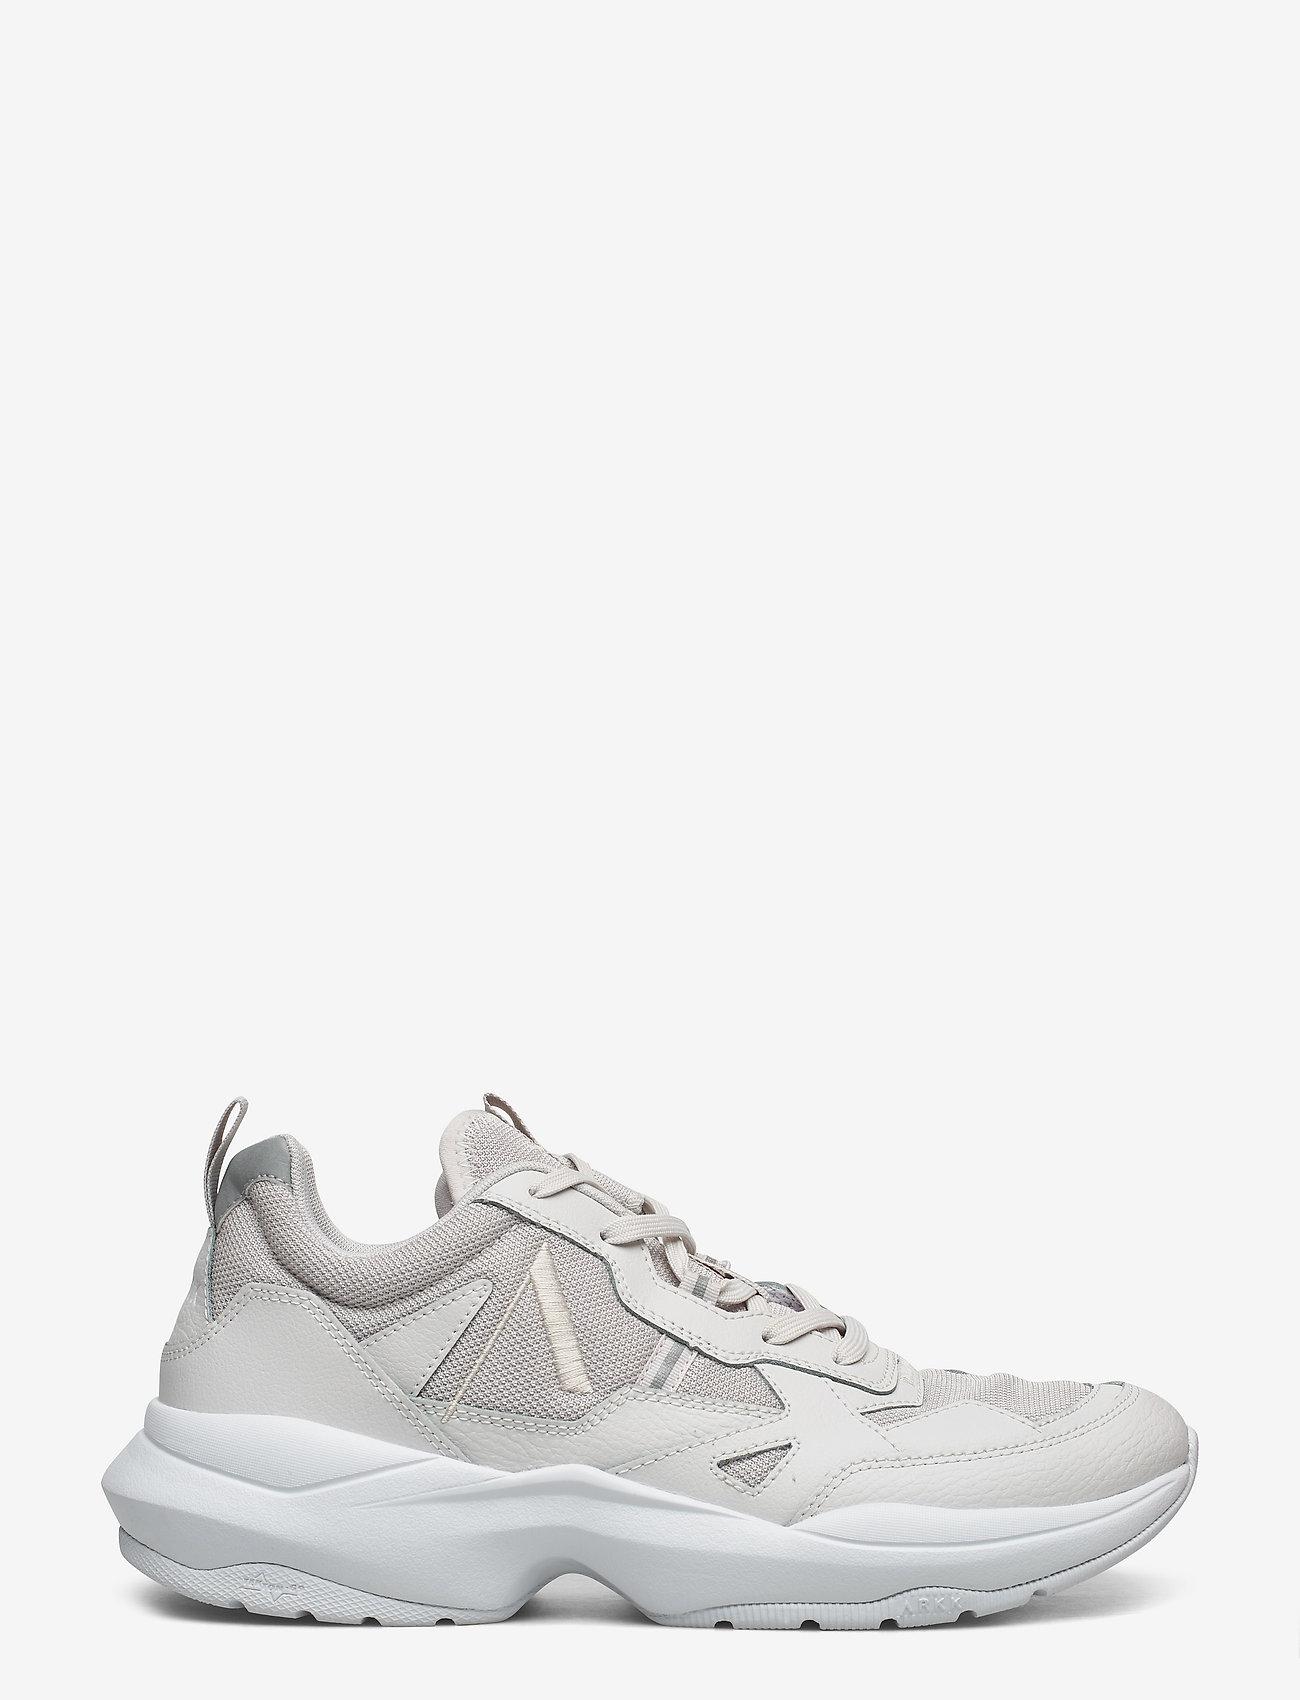 Arkk Copenhagen Quantm Leather T-g9 Soft Grey - Men Sneakers